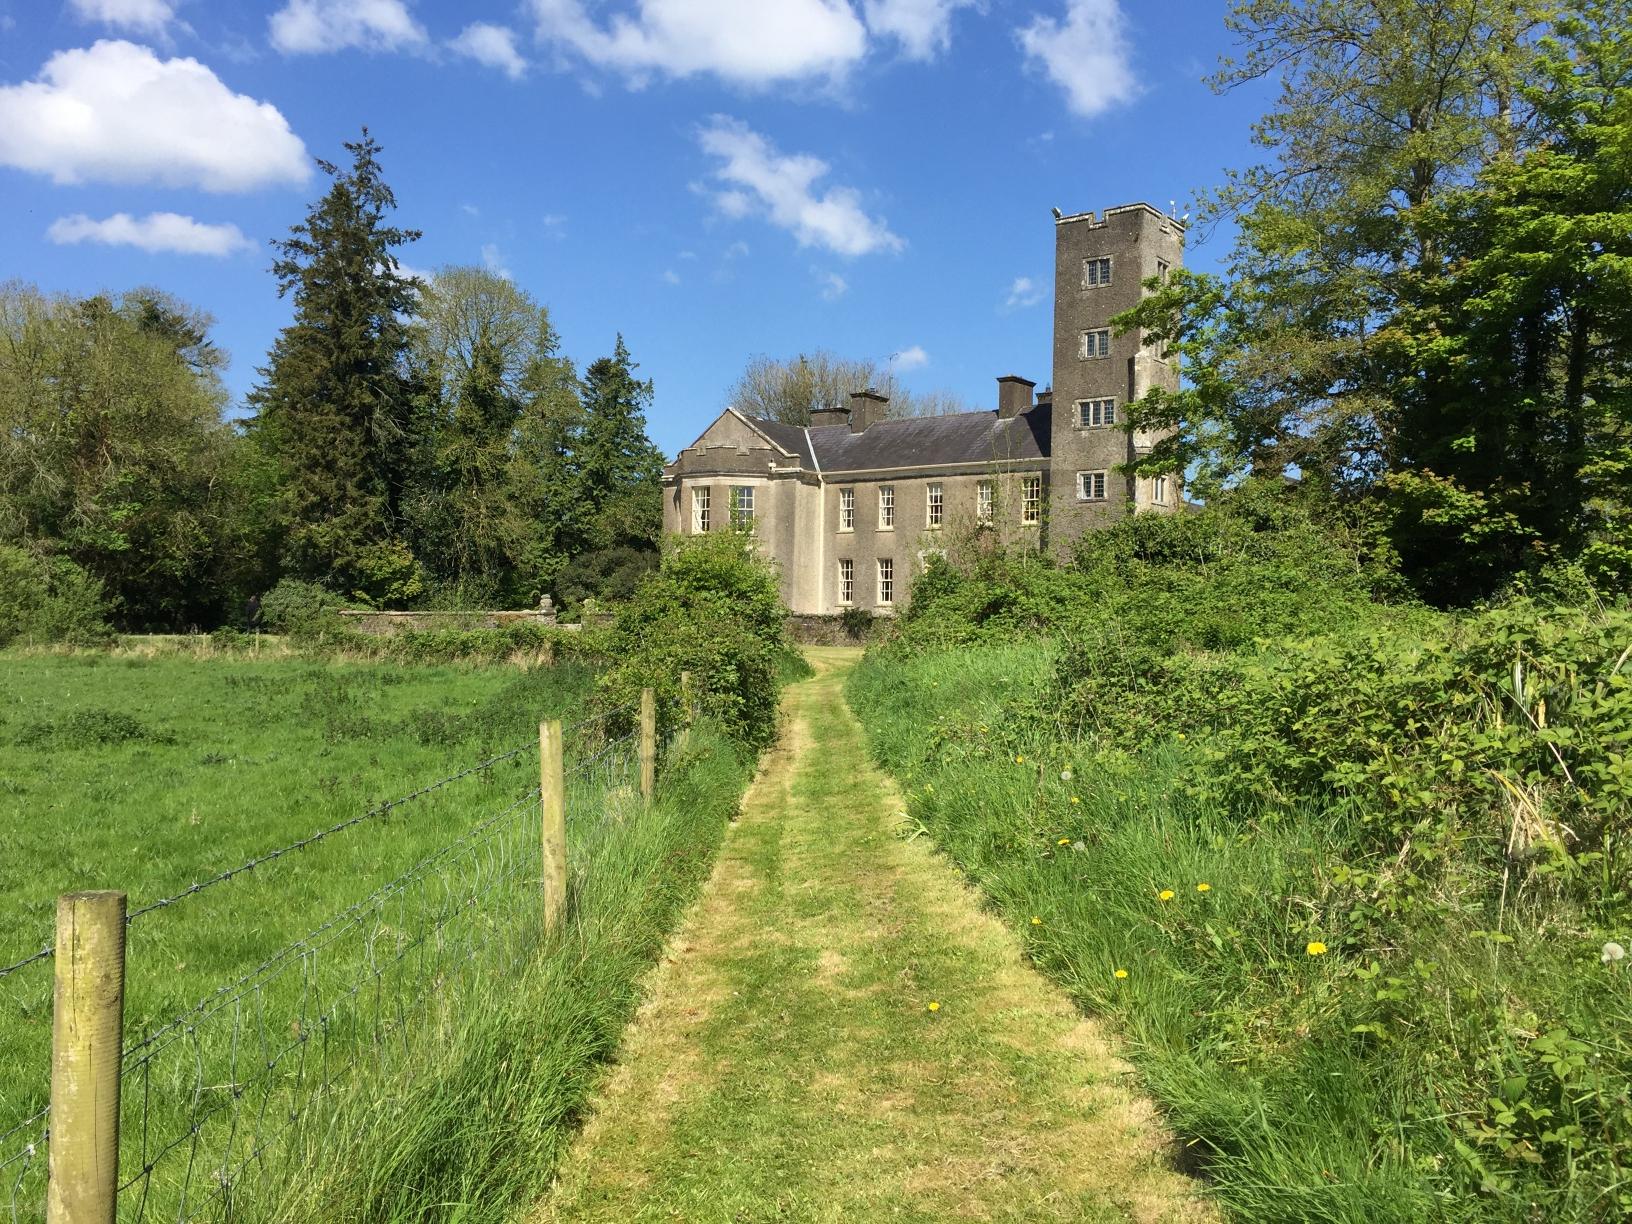 fermanagh_belle_isle_Castle_bear_grylls_ni_explorer_niexplorer